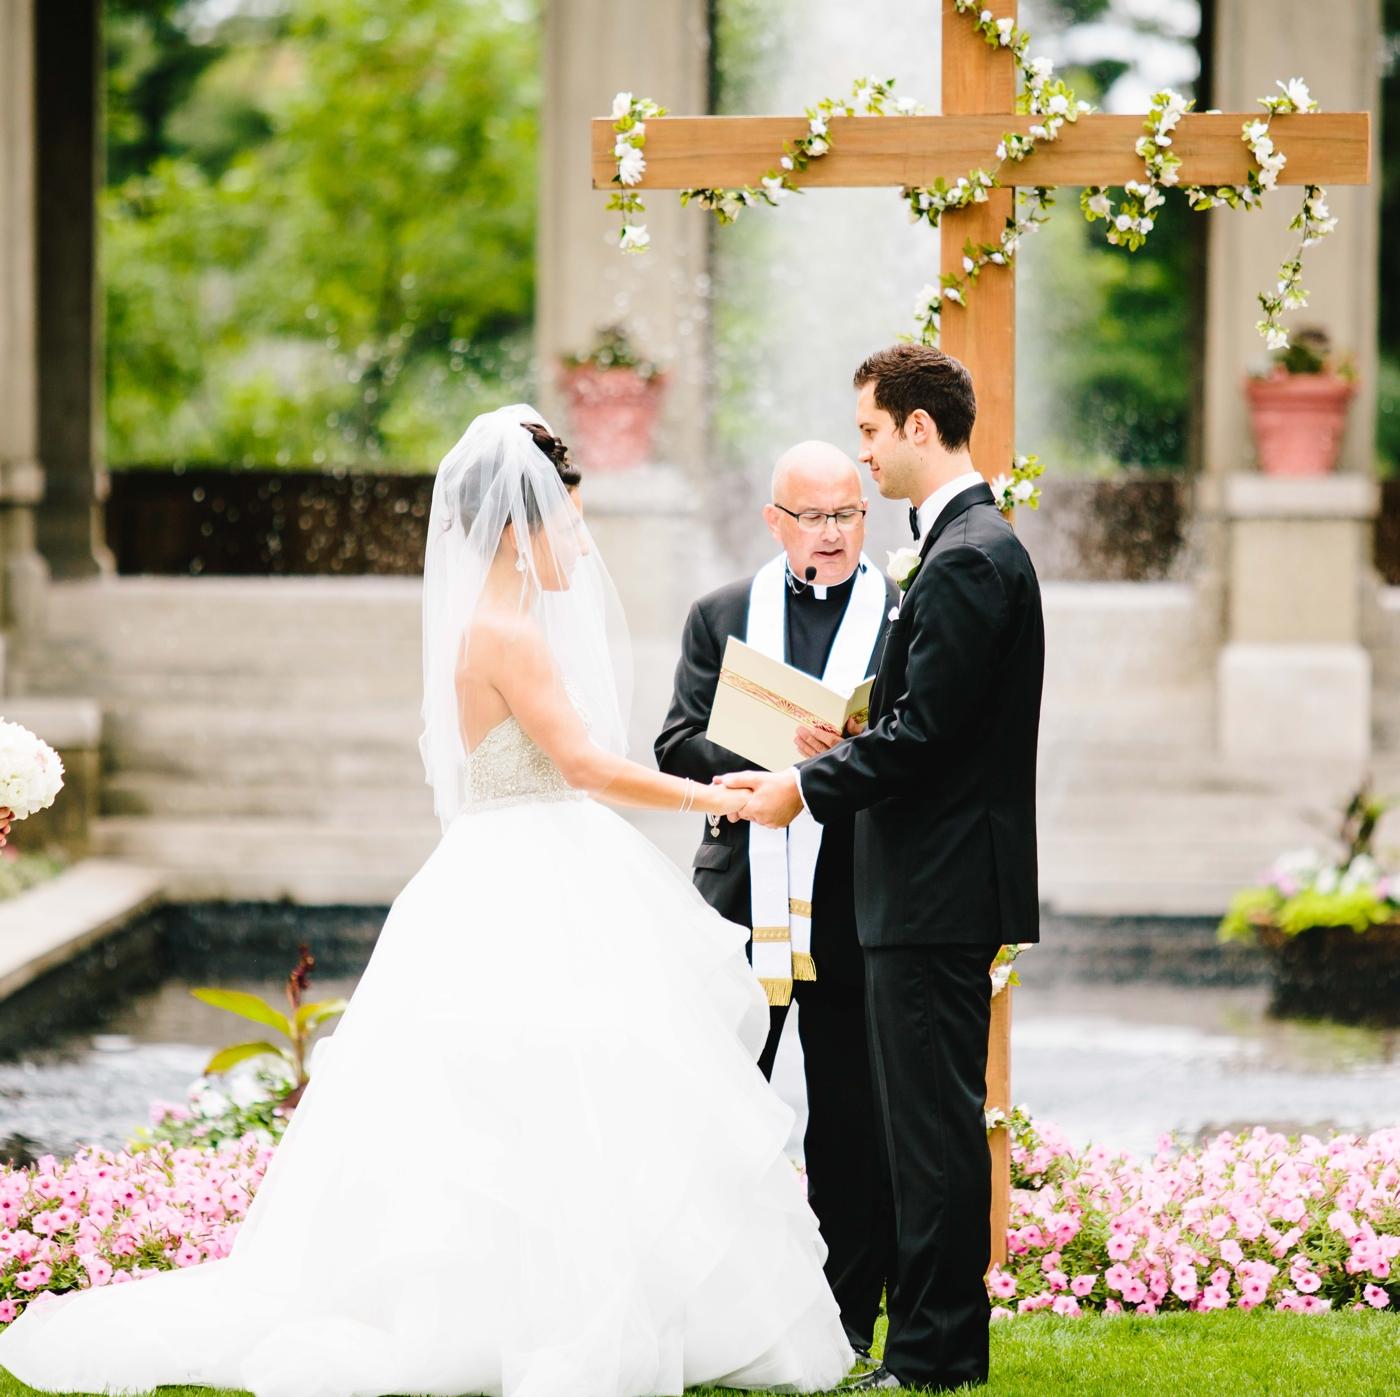 chicago-fine-art-wedding-photography-smeja25